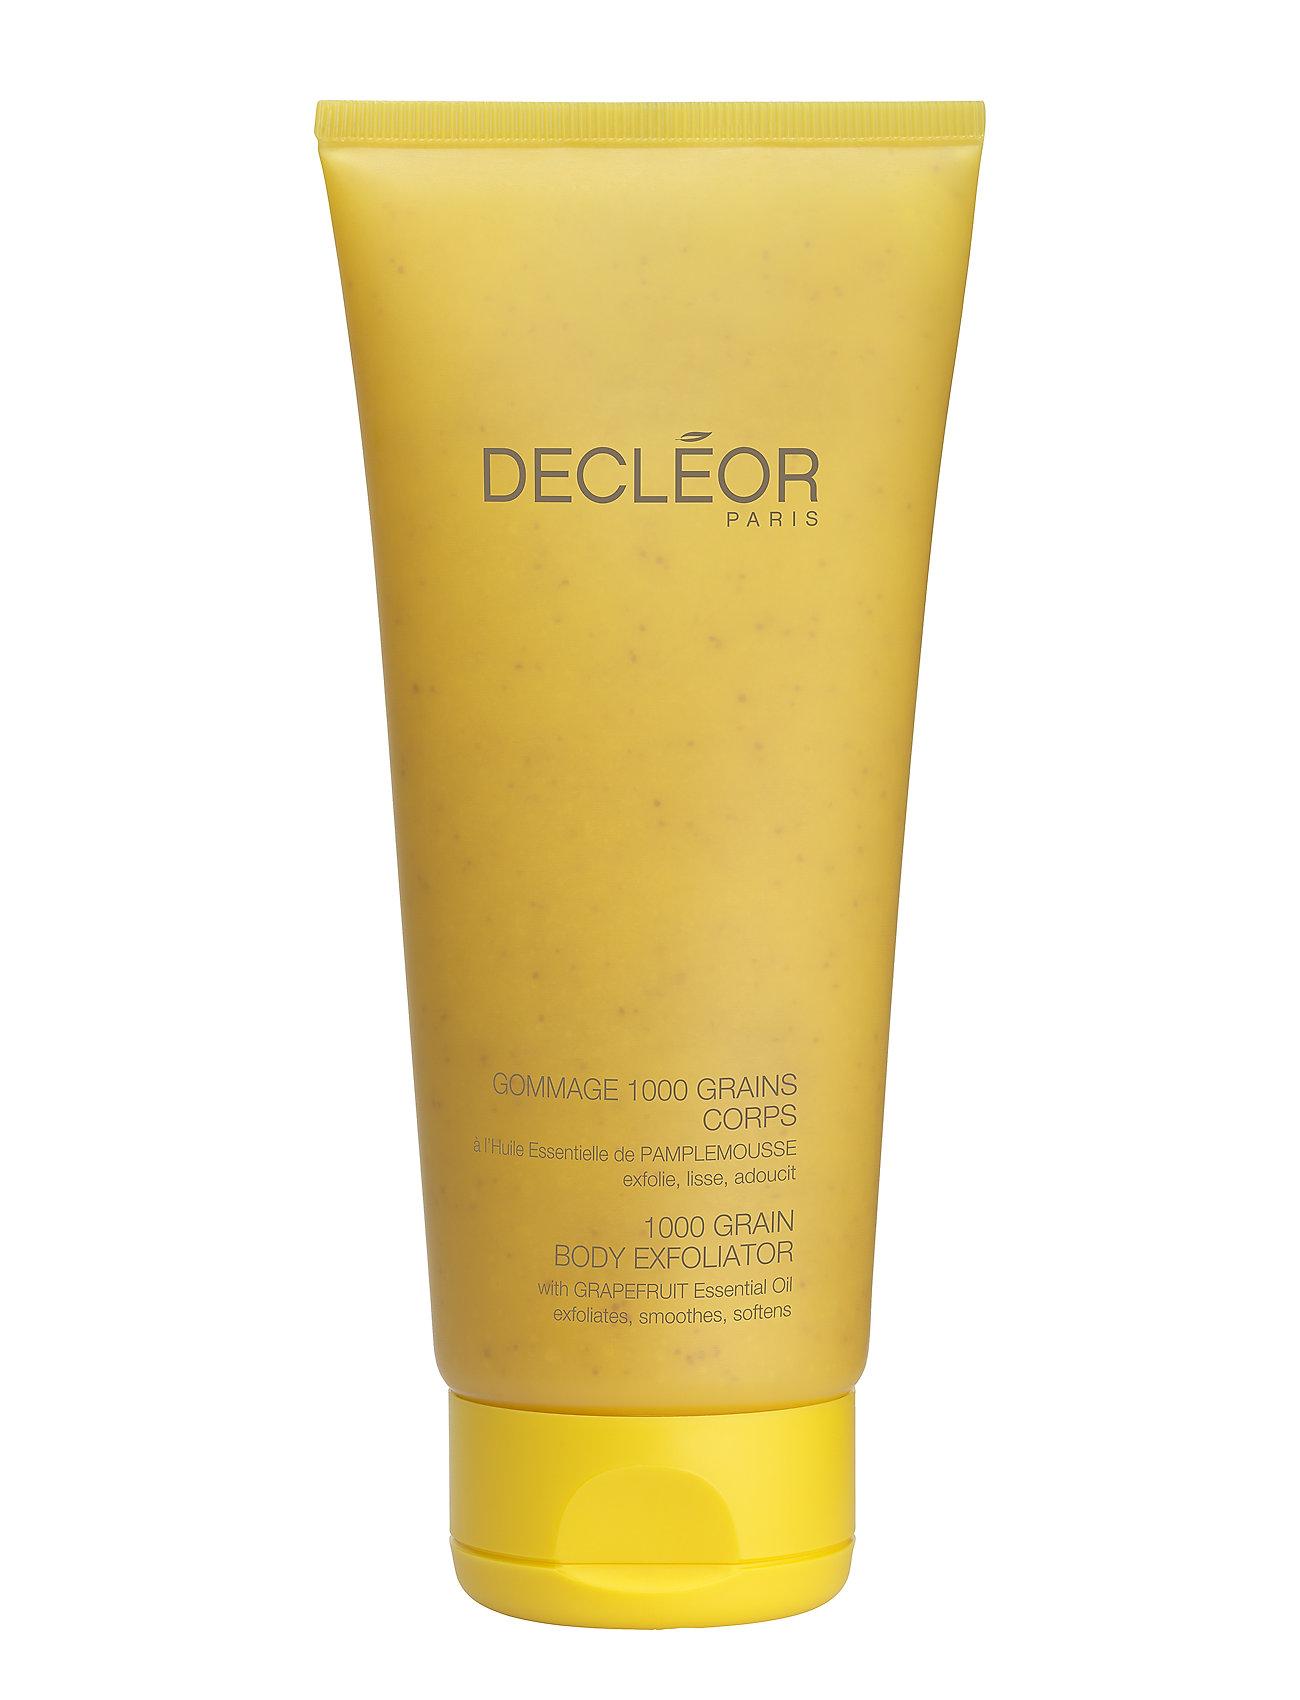 Decléor 1000 Grain Body Exfoliator - CLEAR